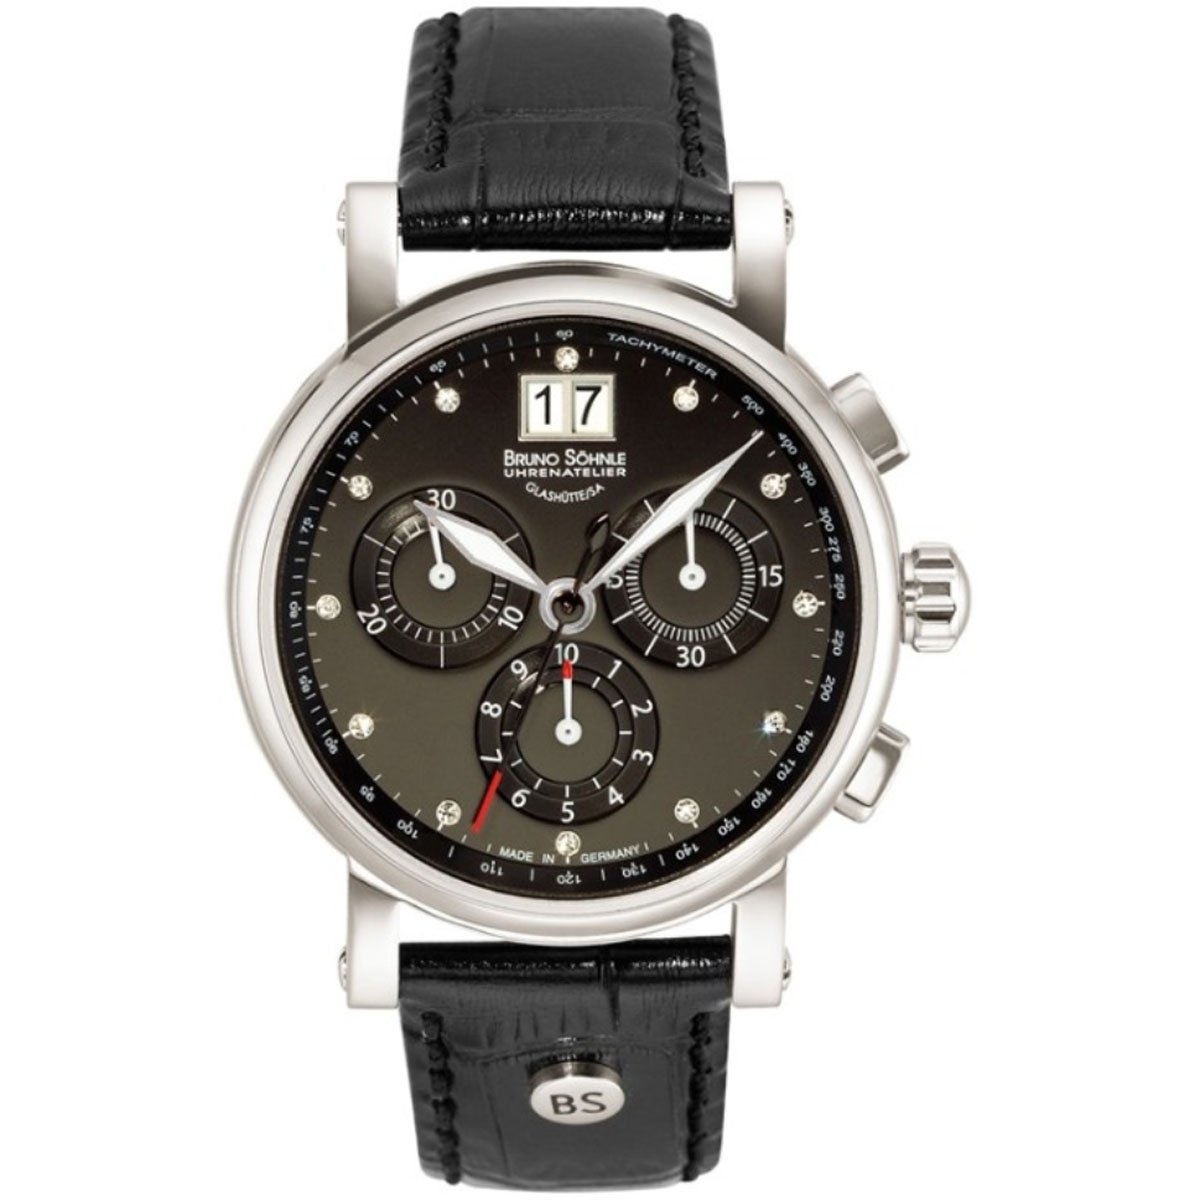 Damen-Armbanduhr Armida Chronograph Quarz Leder 17-13115-751